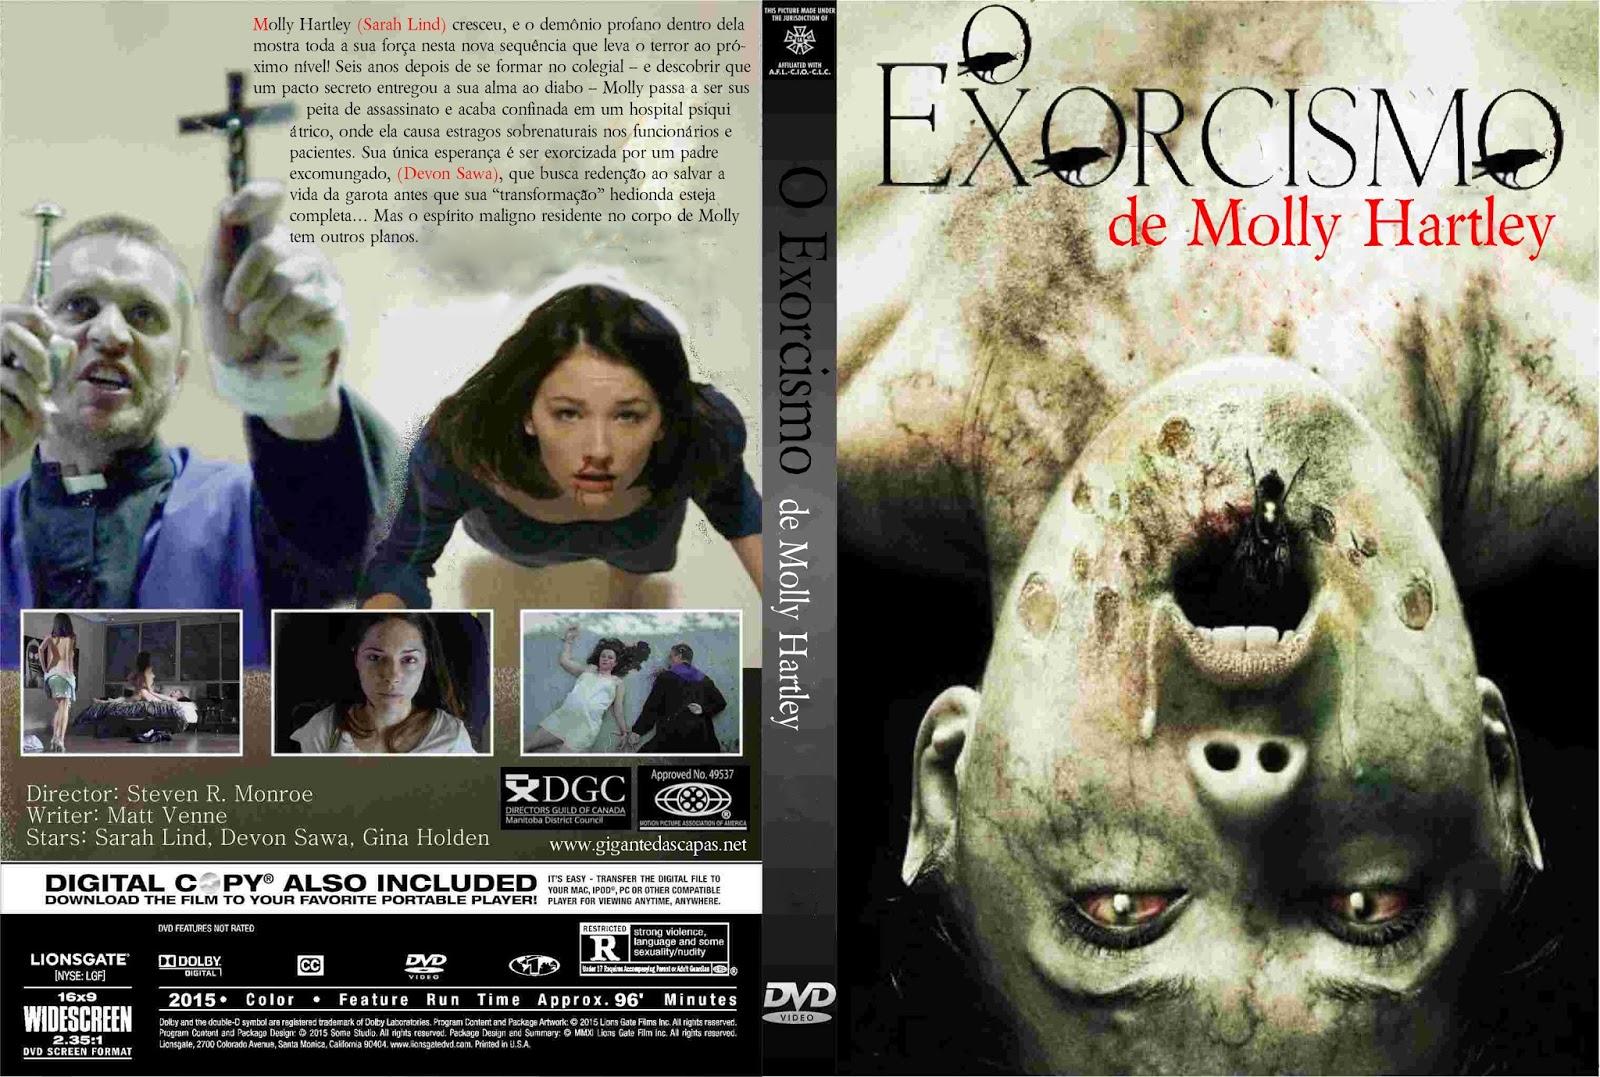 Exorcismus de molly hartley online dating